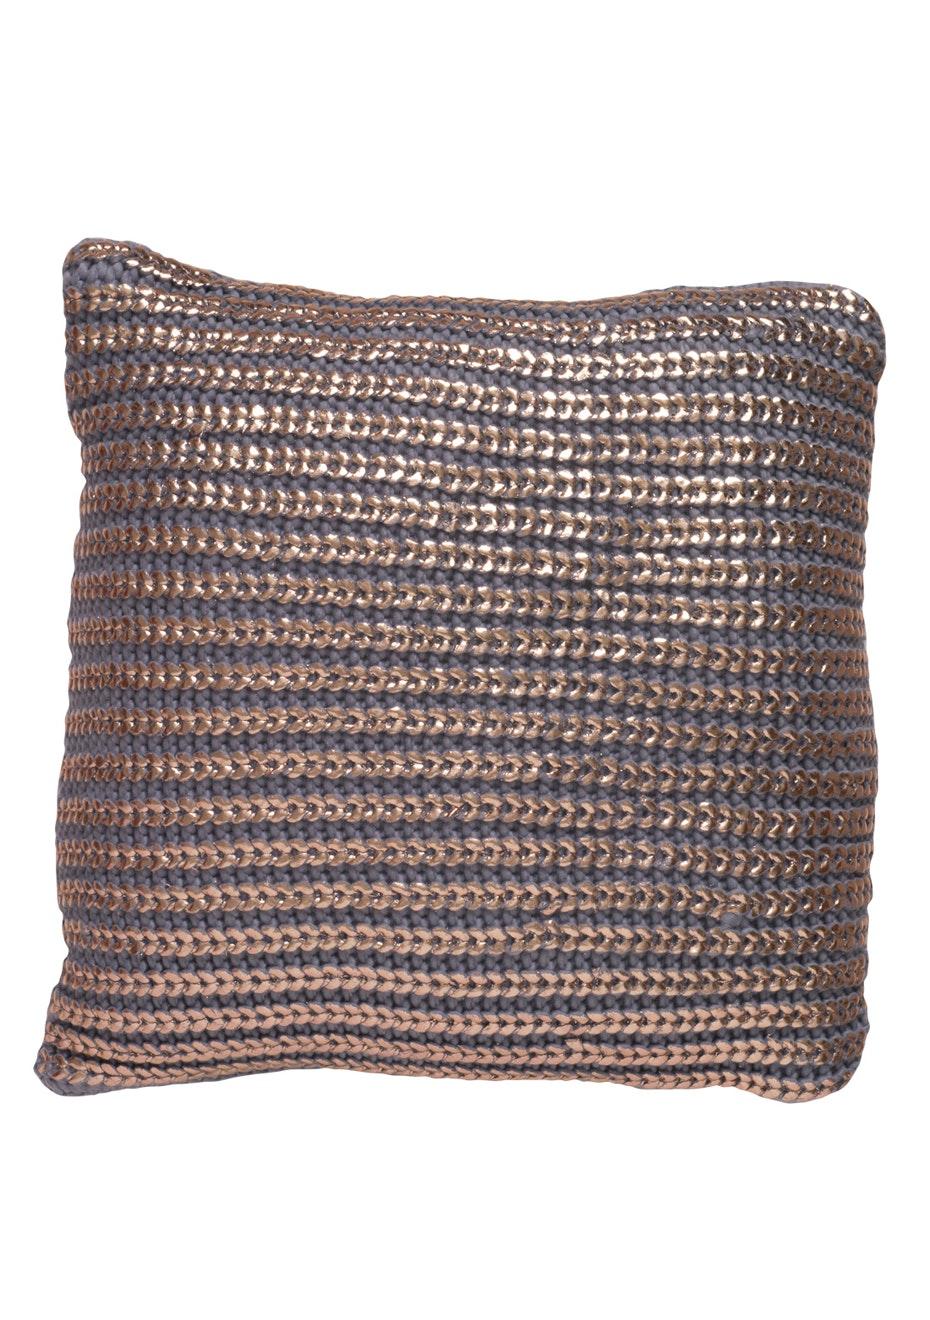 Jason - Copper knit cushion